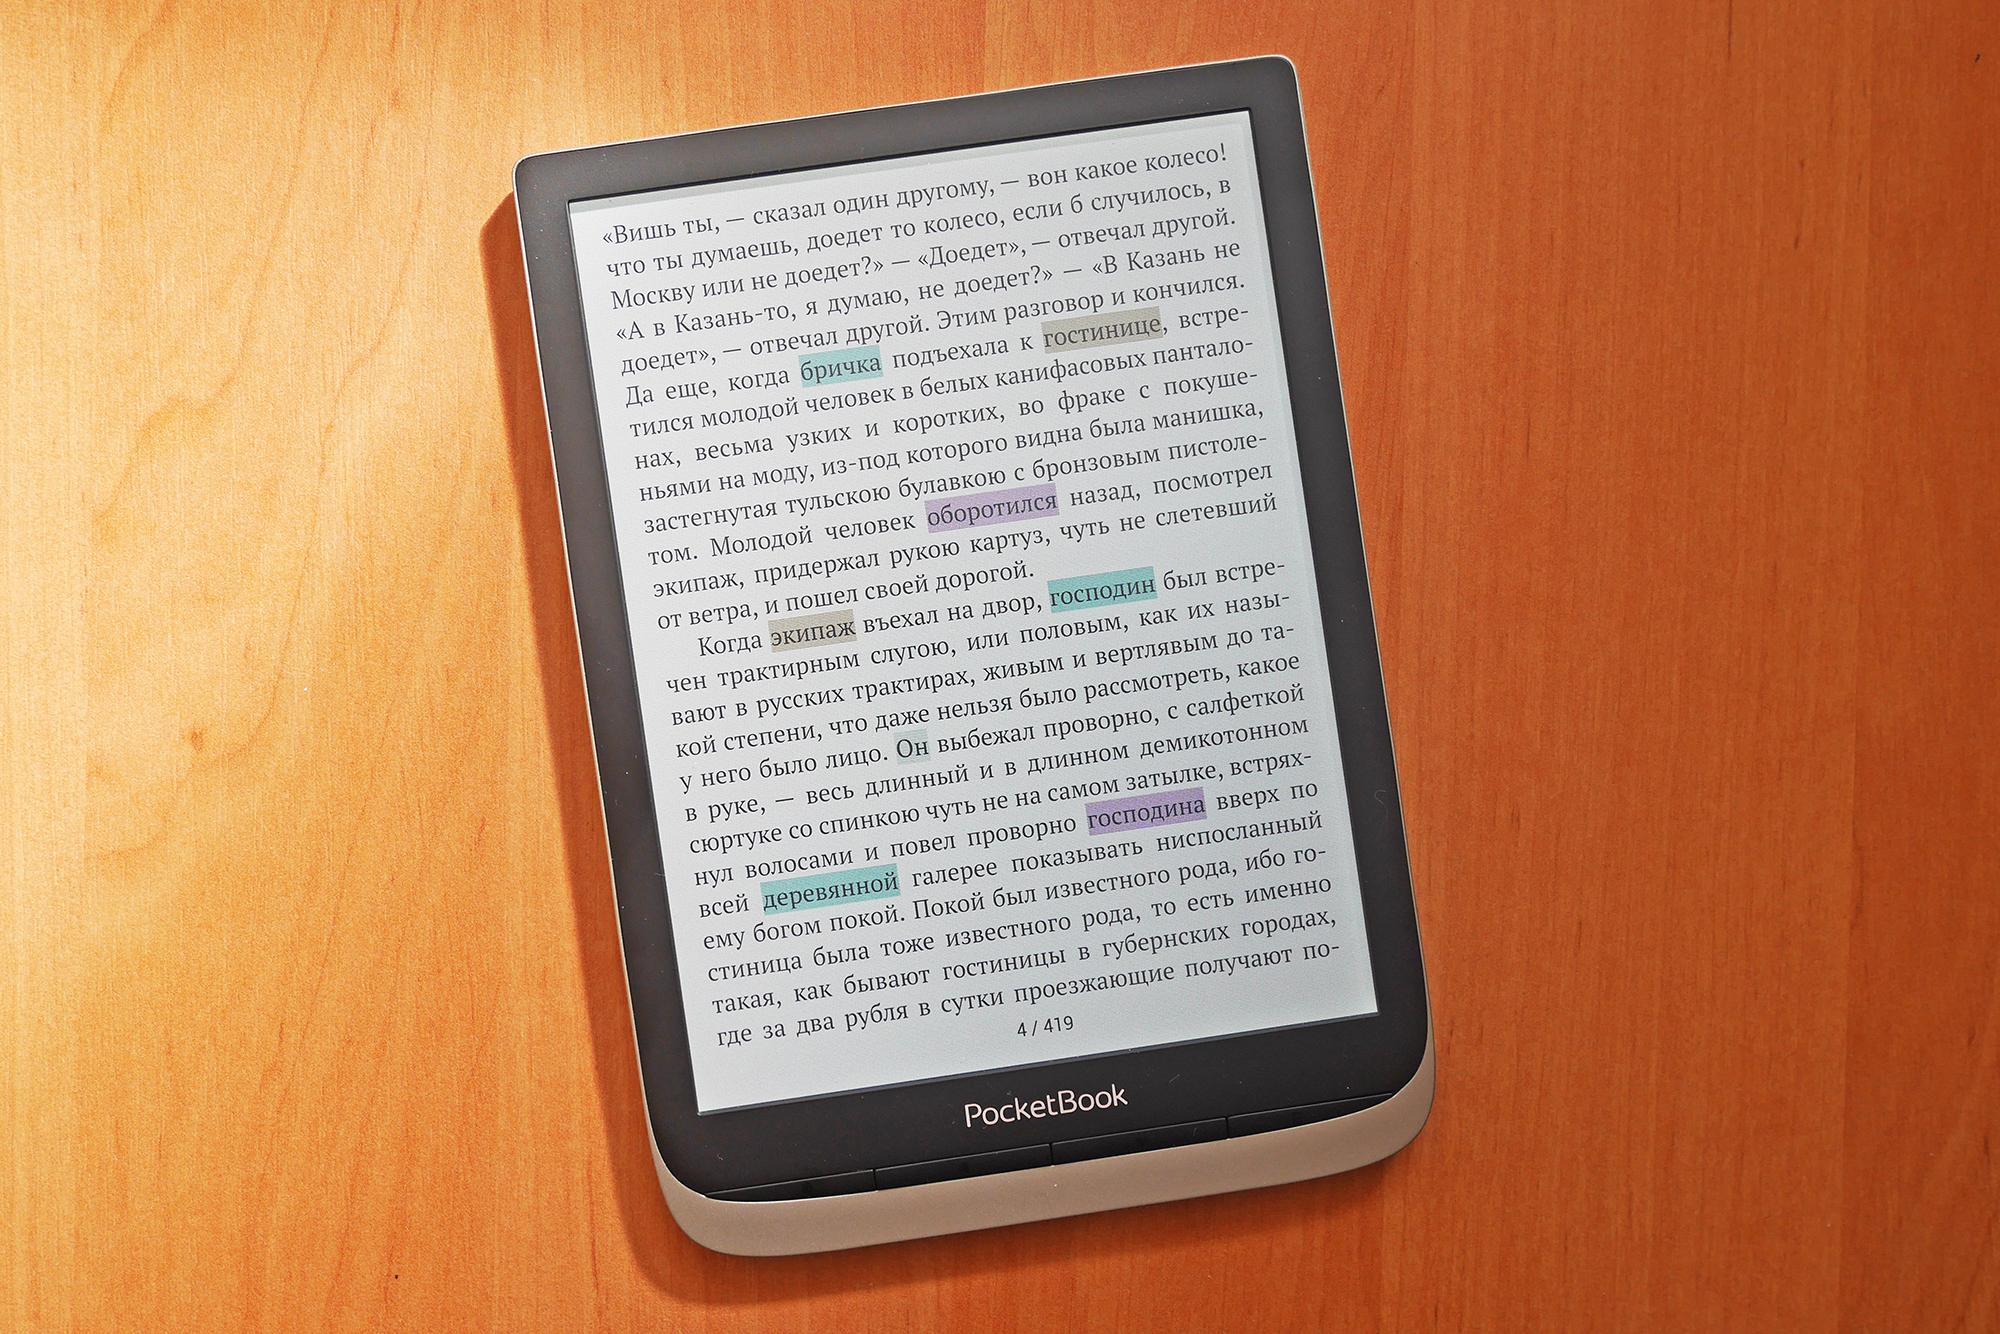 PocketBook 740 Color - •цветной экран E Ink Kaleido Plus с подсветкой